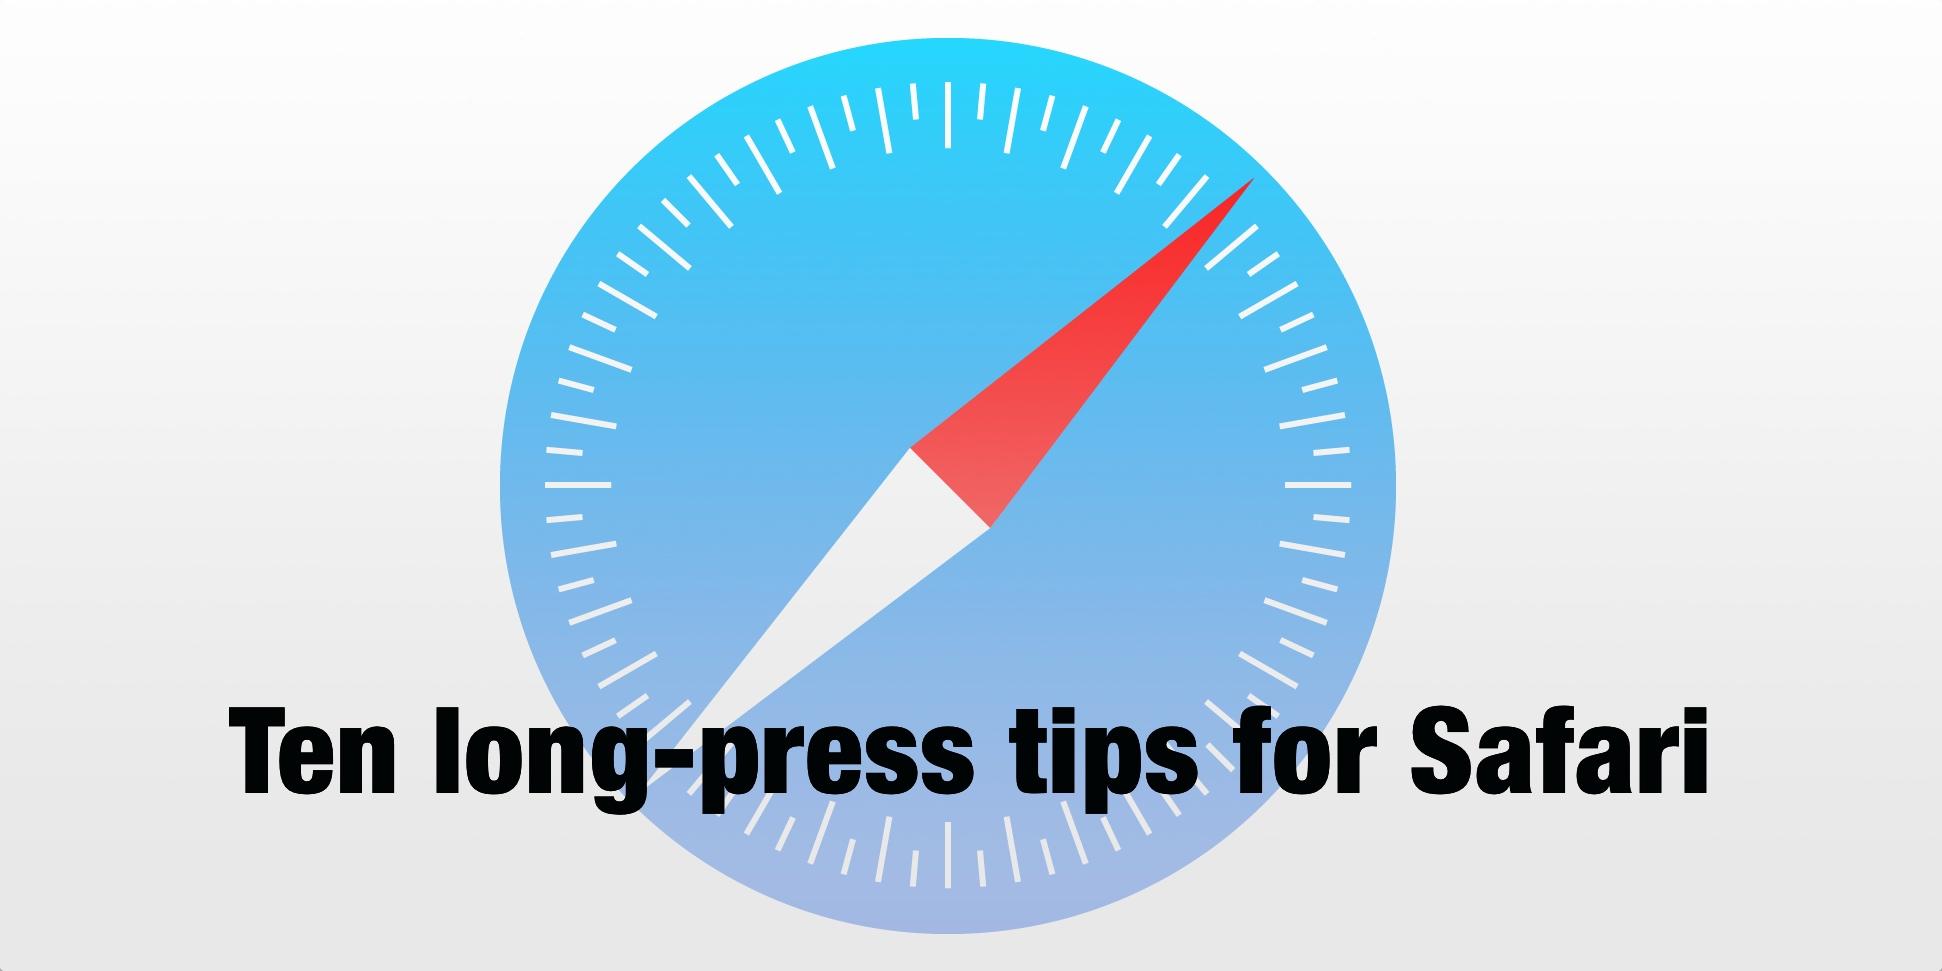 Tips and Tricks: Ten Safari long-press shortcuts for iPhone and iPad